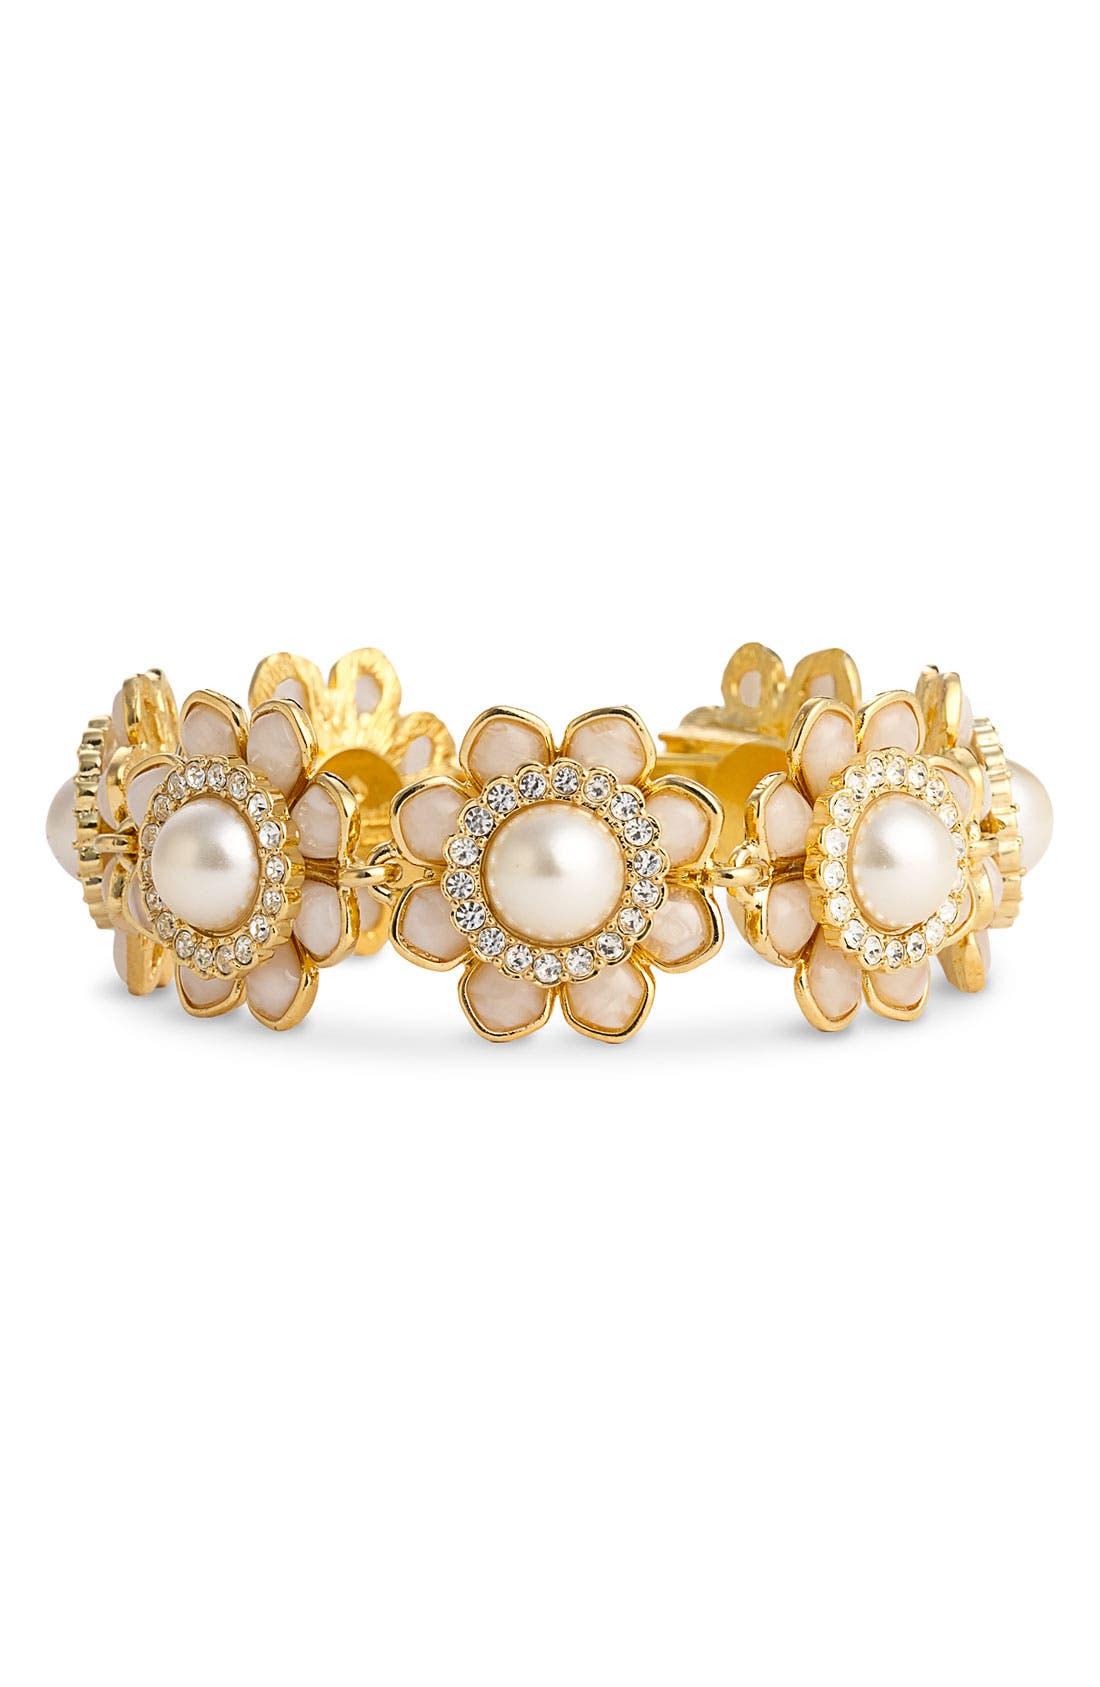 Main Image - kate spade new york 'sweet zinnia' floral line bracelet